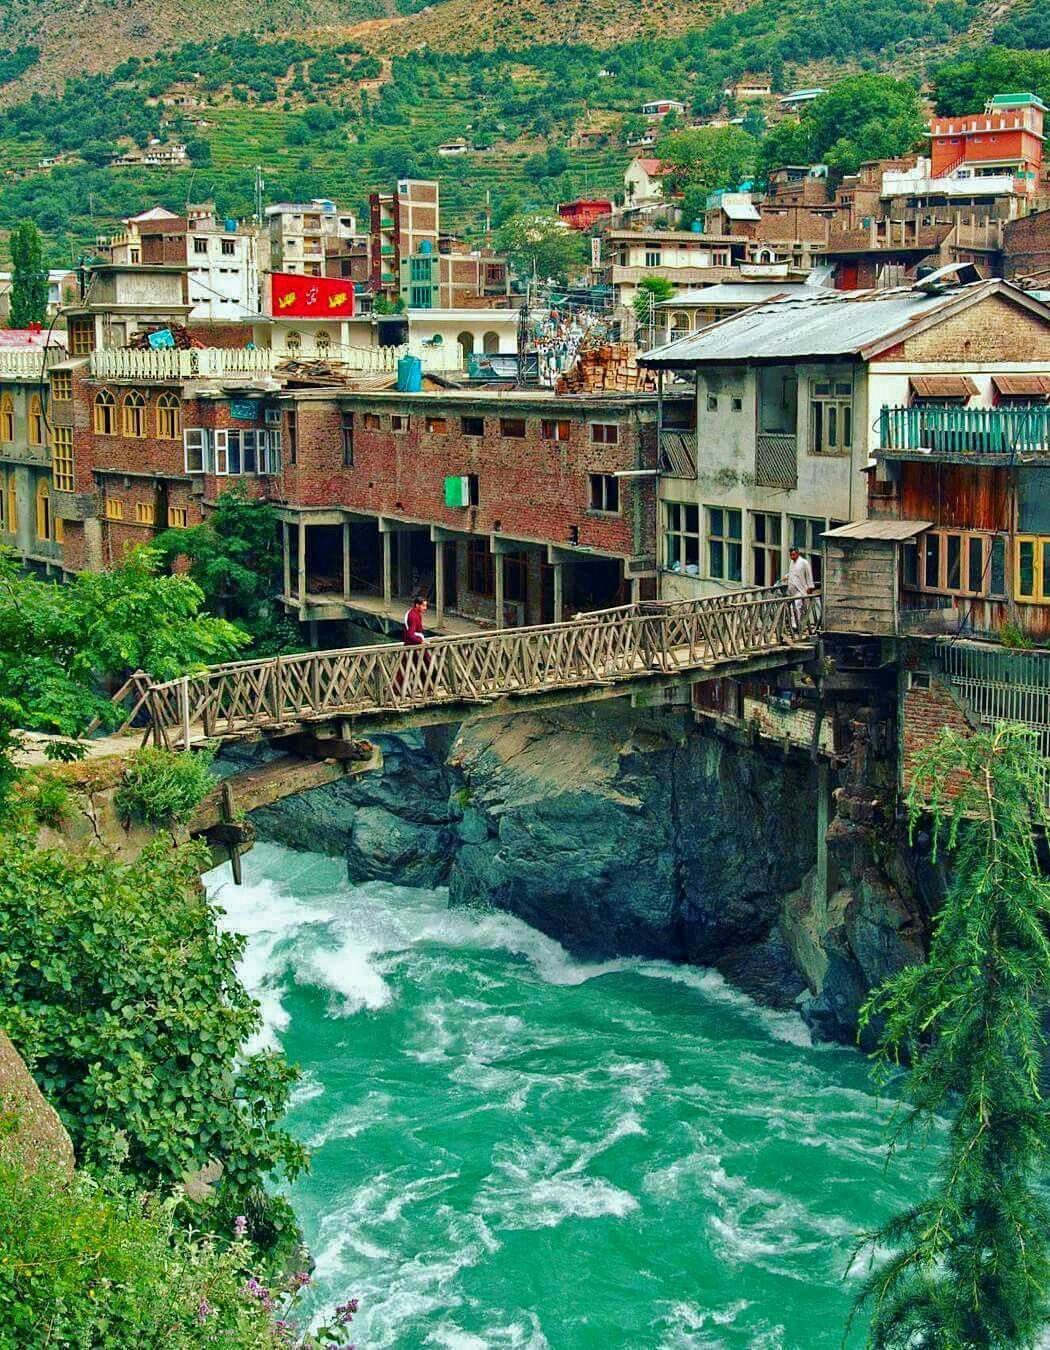 Bahrain Swat Valley Pakistan Pakistan Pictures Pakistan Beautiful Places To Visit